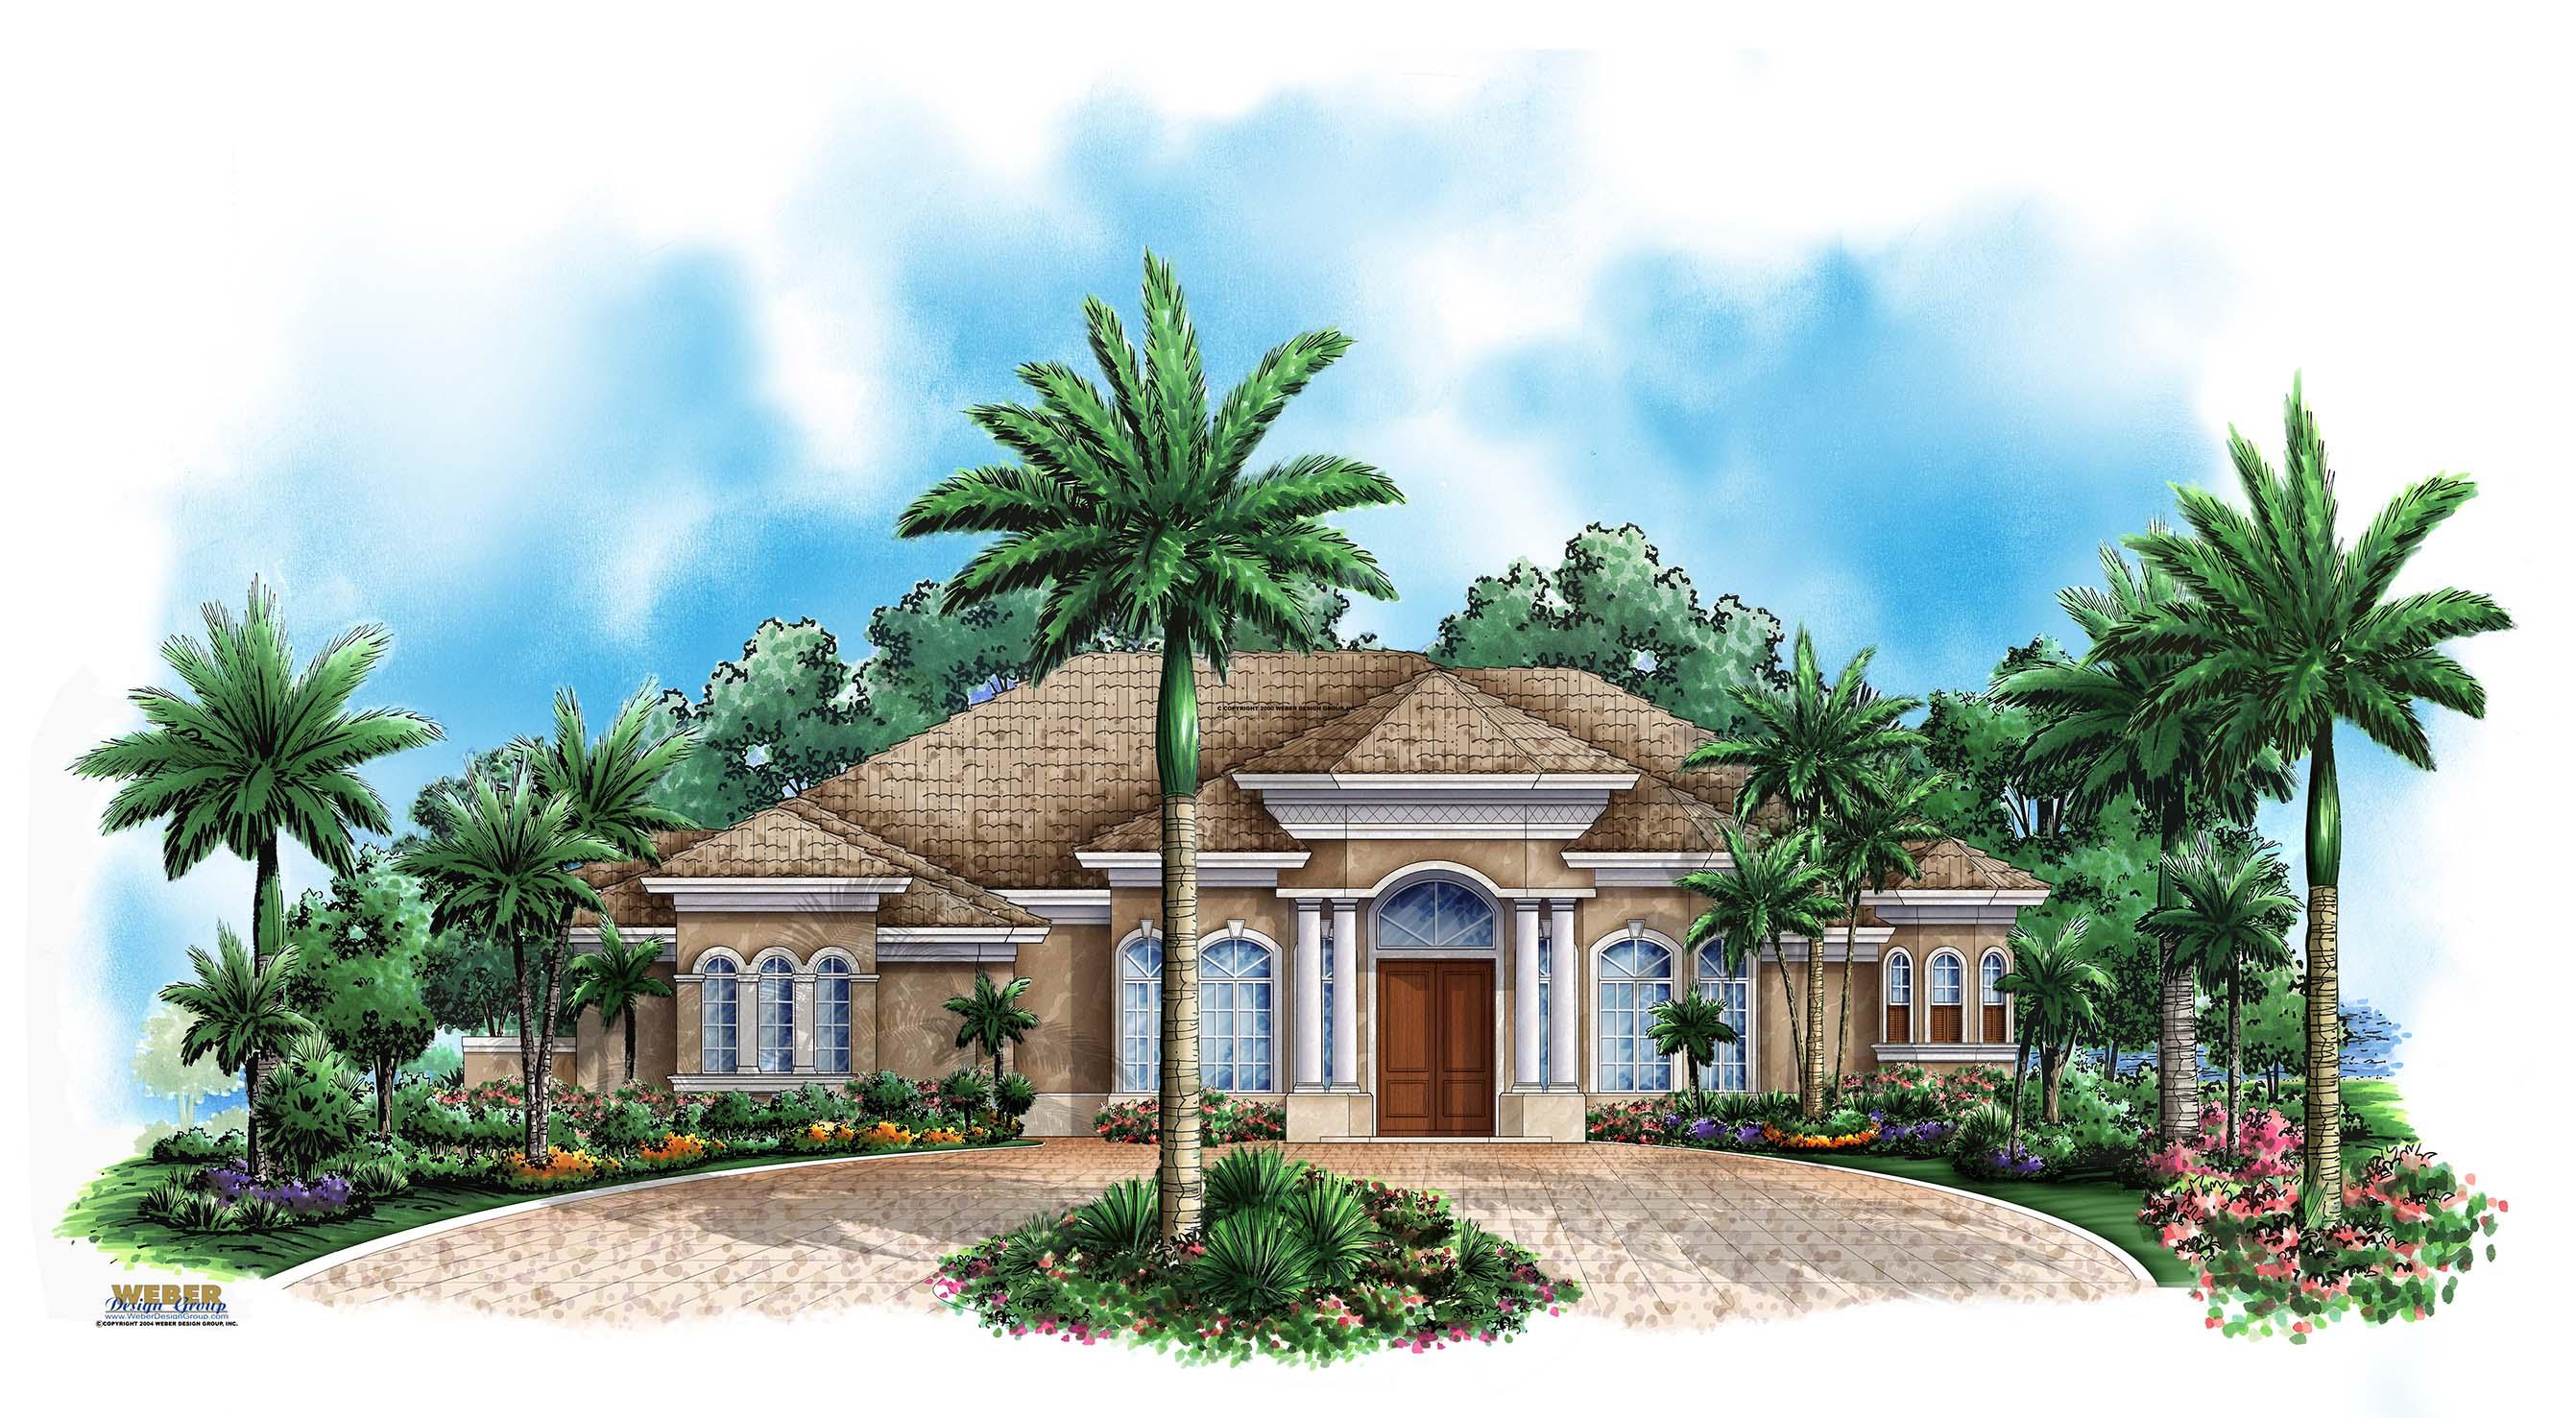 mediterranean house plans - luxury modern floor plans (with photos)